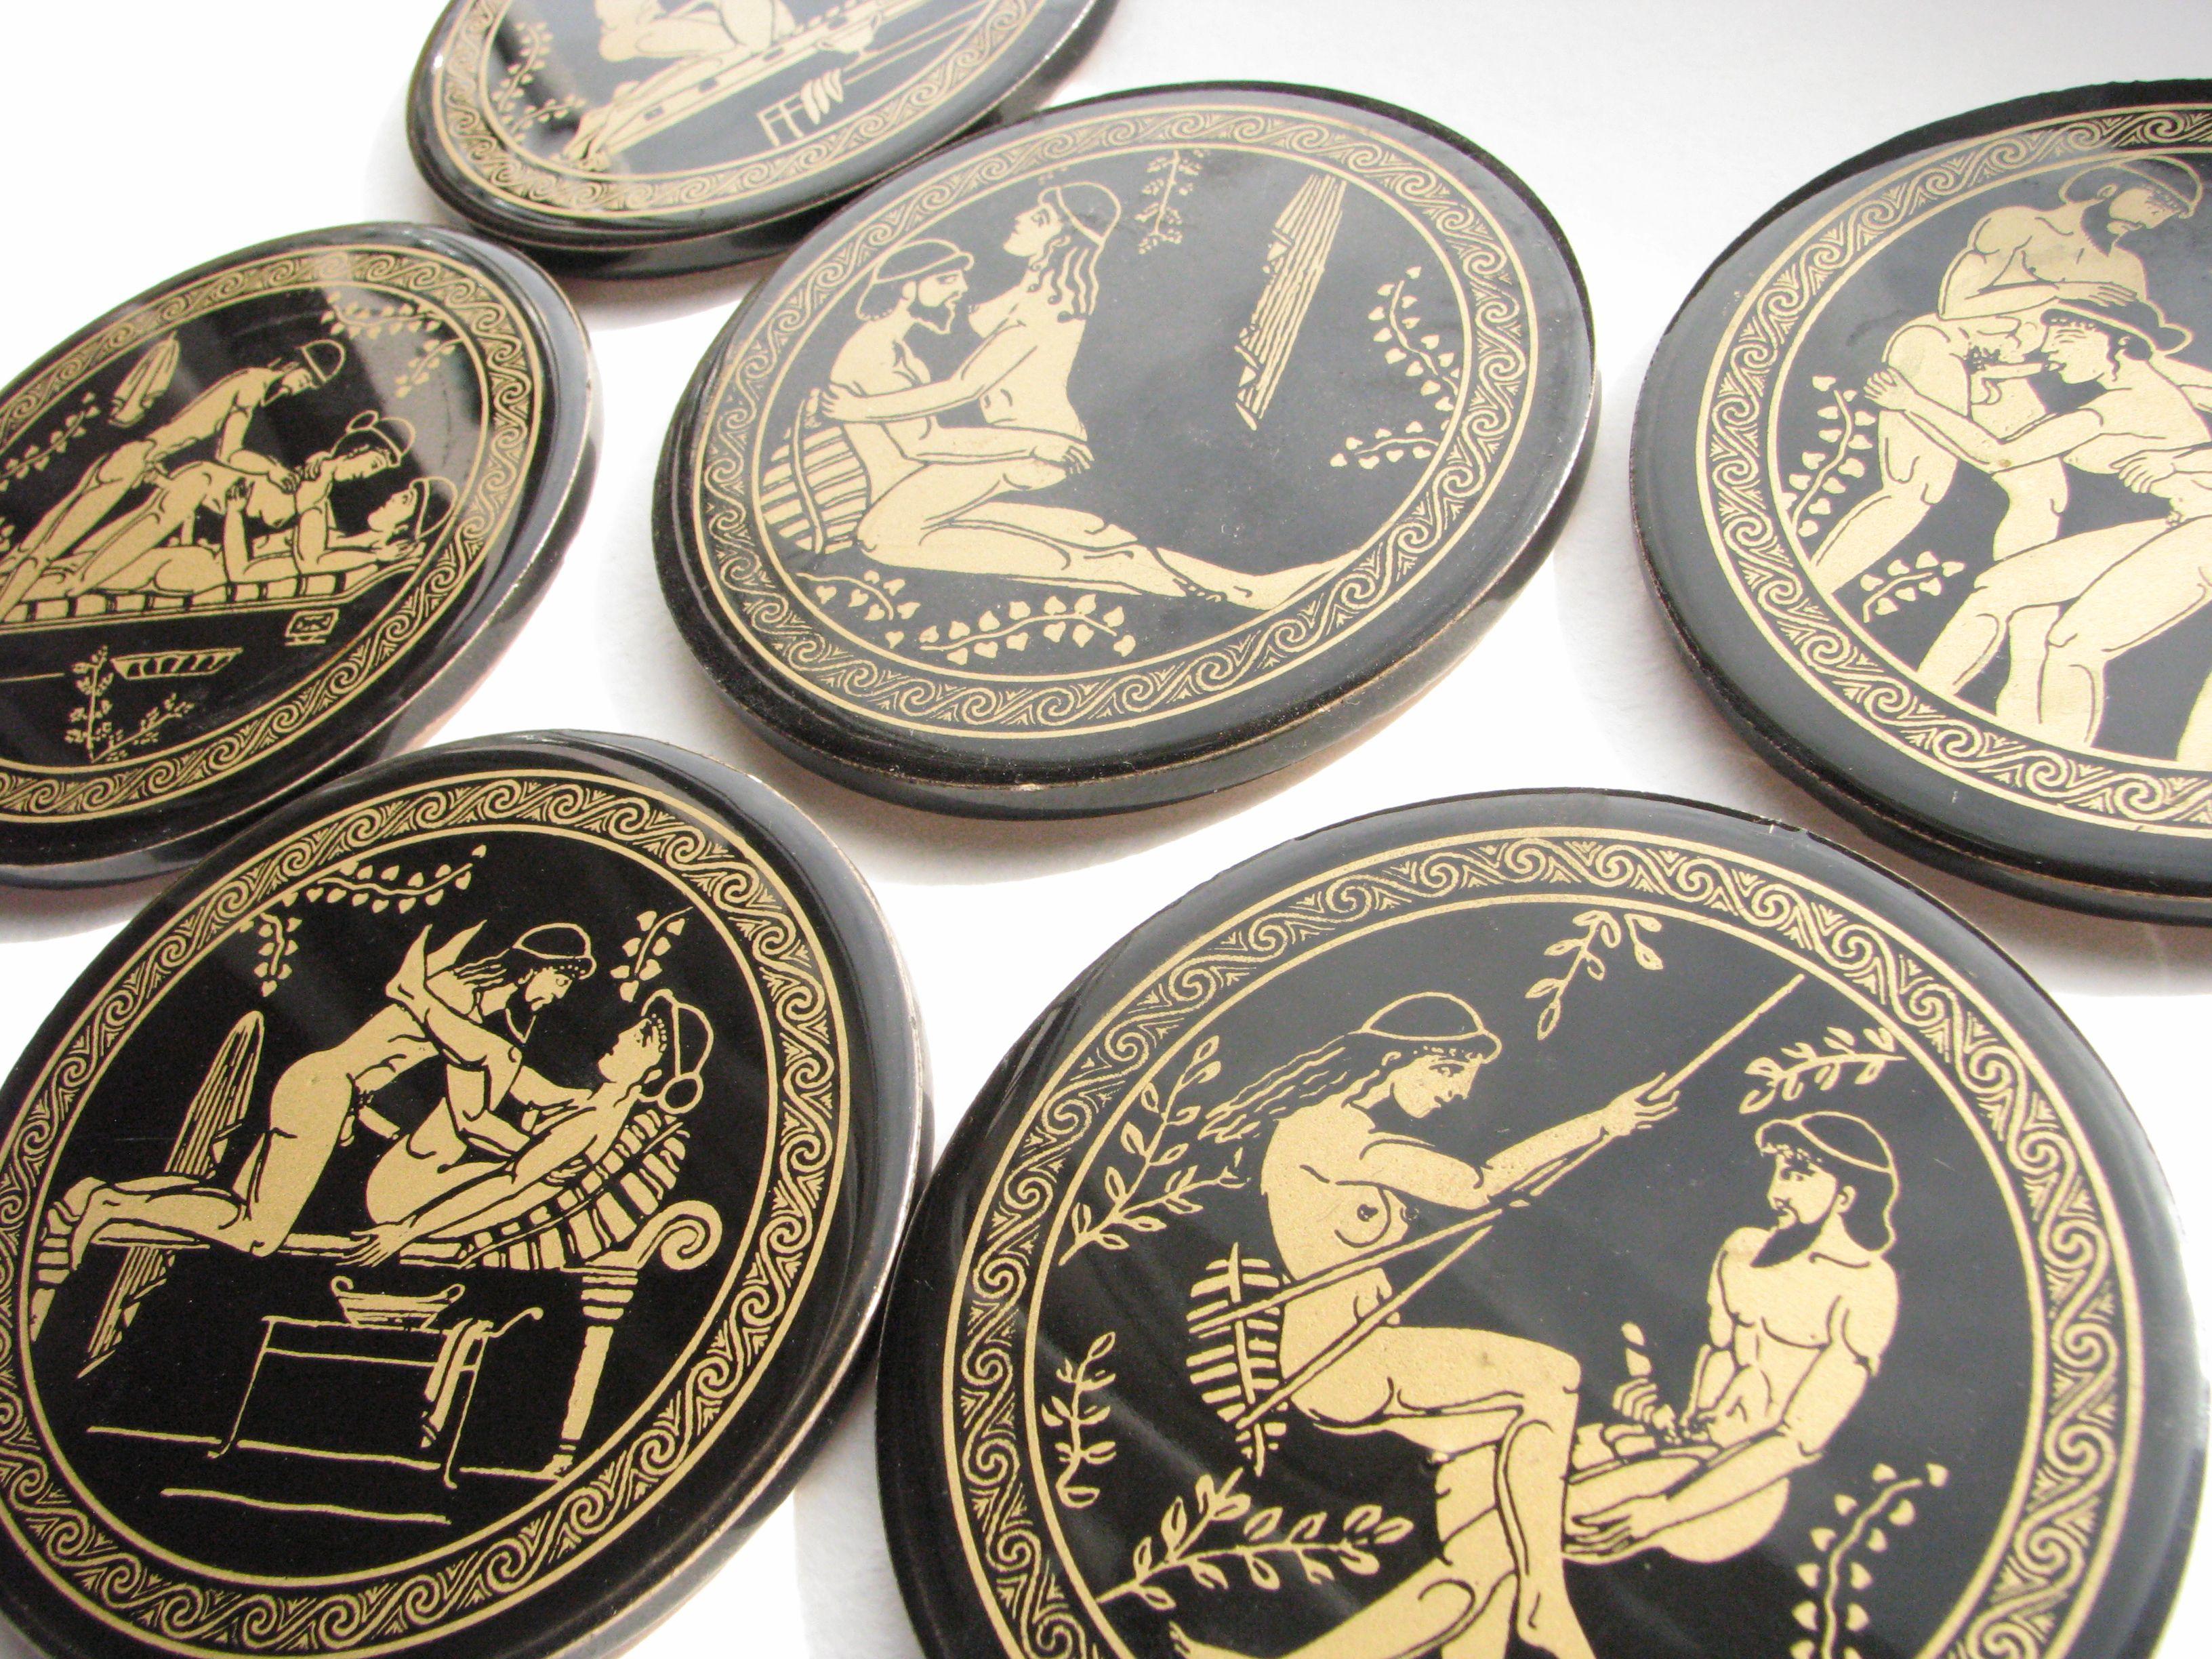 pics-of-erotic-greek-emily-procter-pov